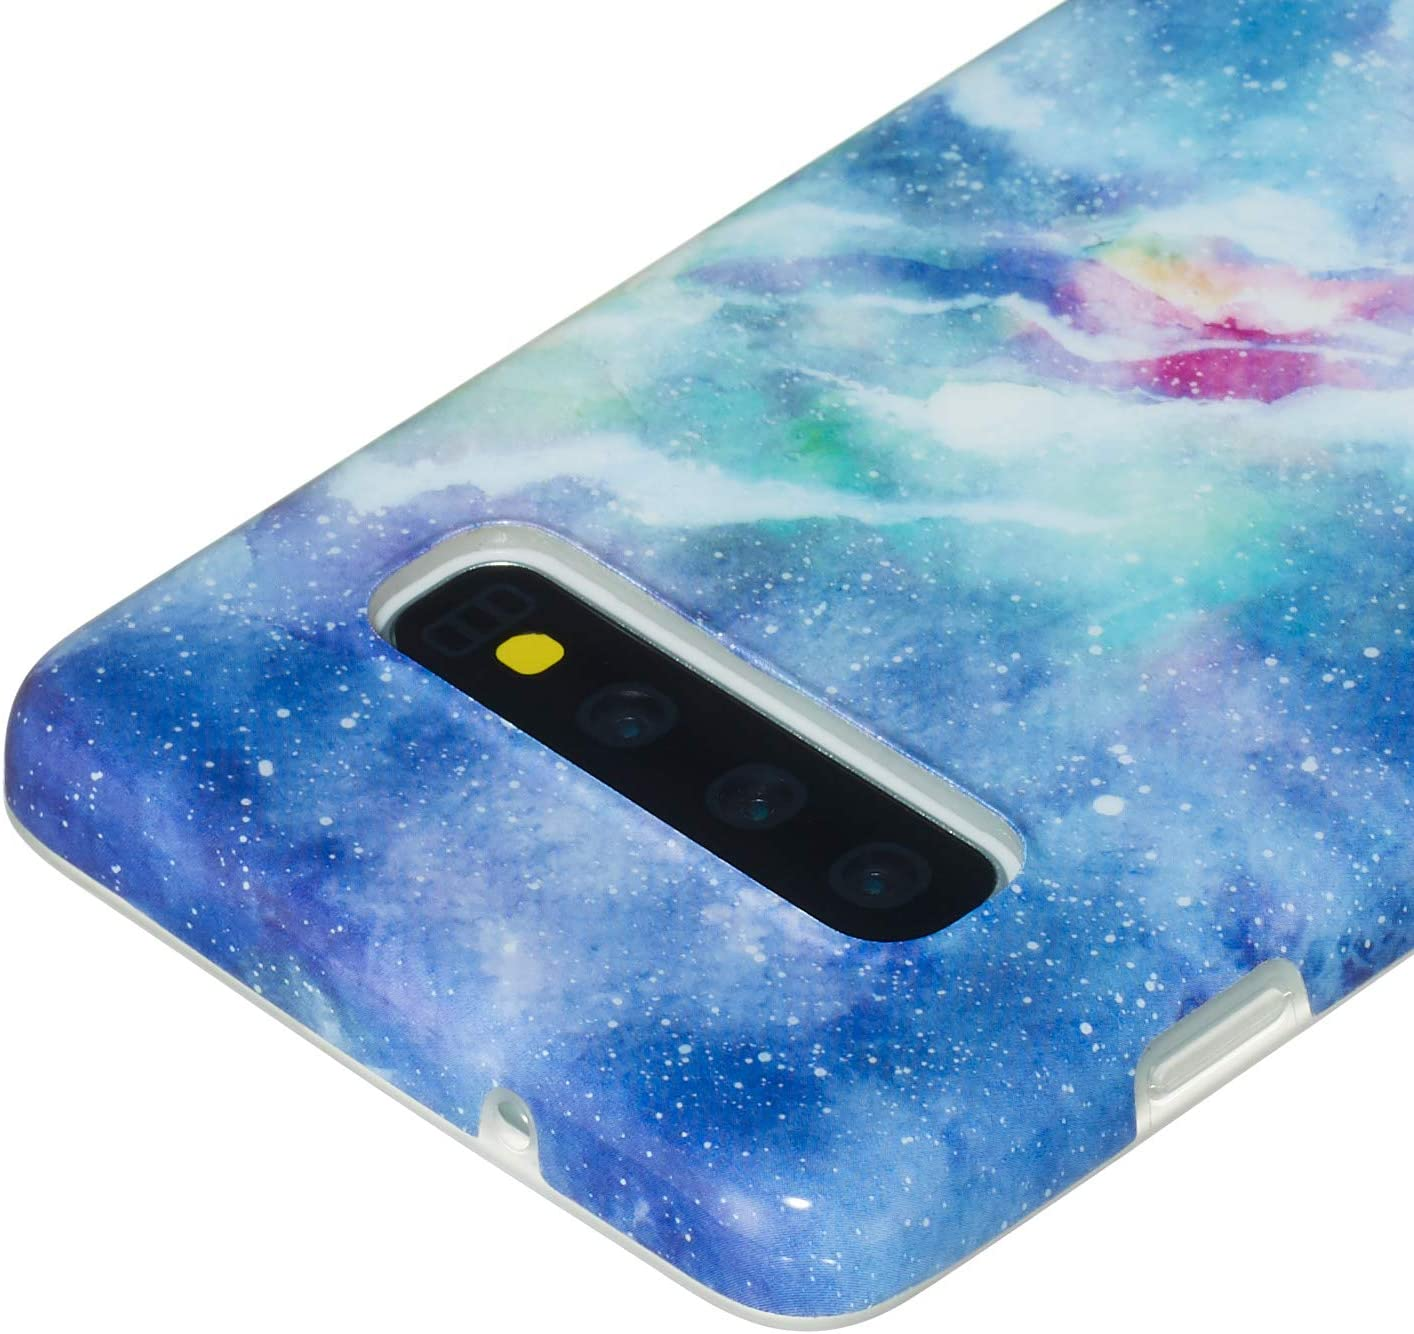 Shinyzone Stylish Black Marble Design Case for Samsung Galaxy S10+,Raised Edge Full Body Drop Resistant Flexible TPU Gel Cover for Samsung Galaxy S10 Plus